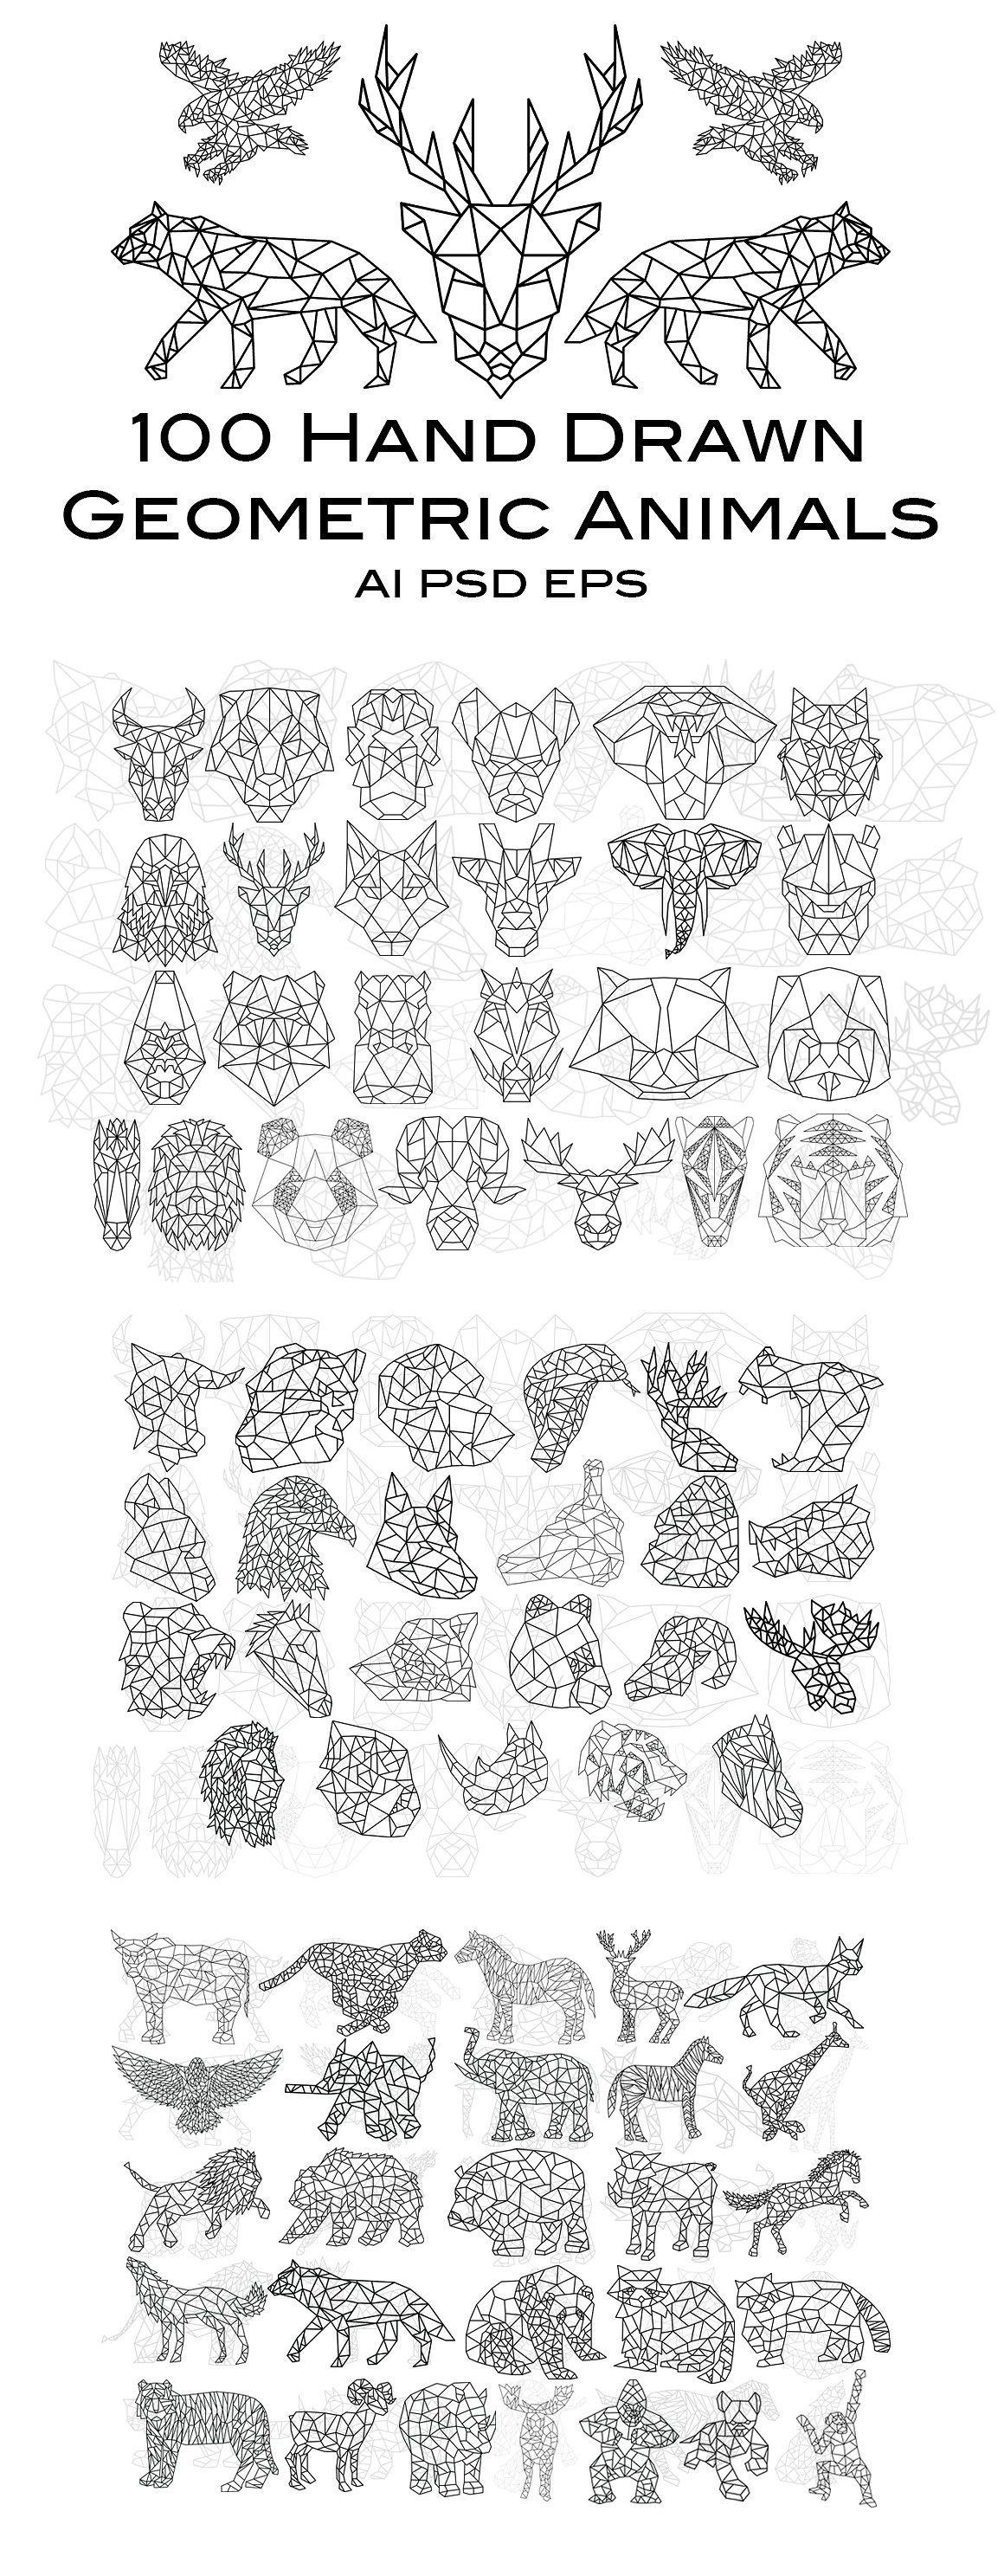 100 Hand Drawn Geometric Animals